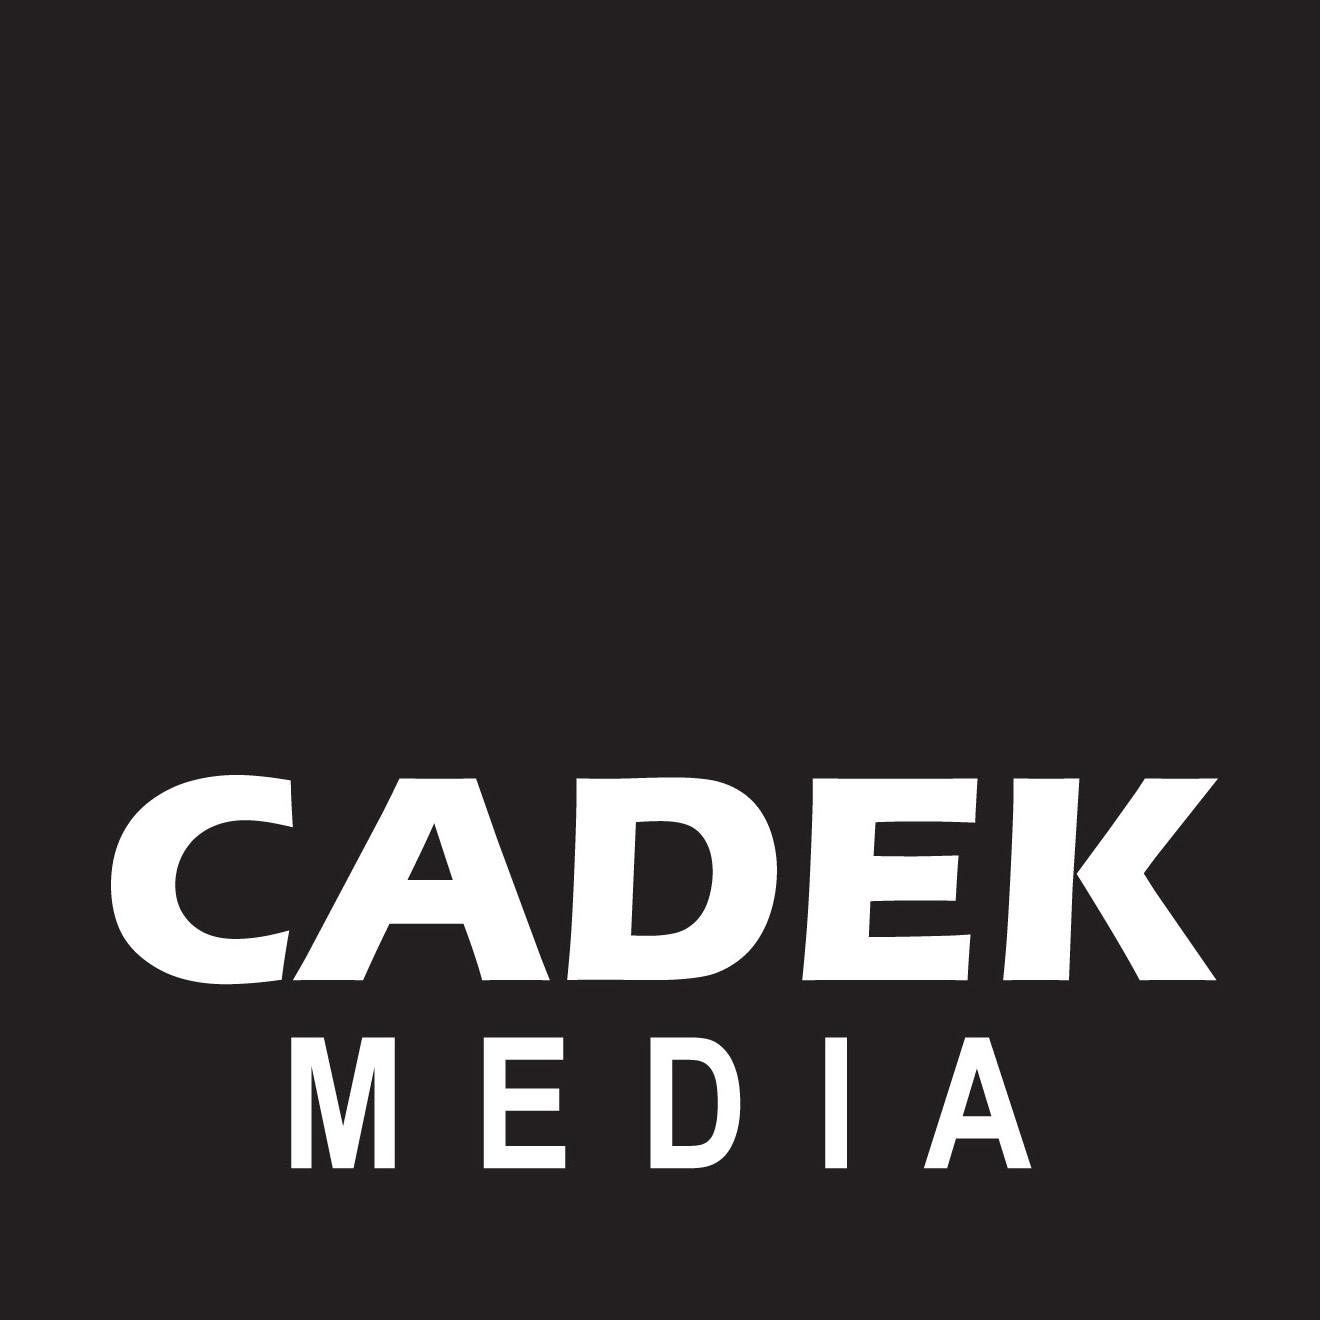 CADEK Media